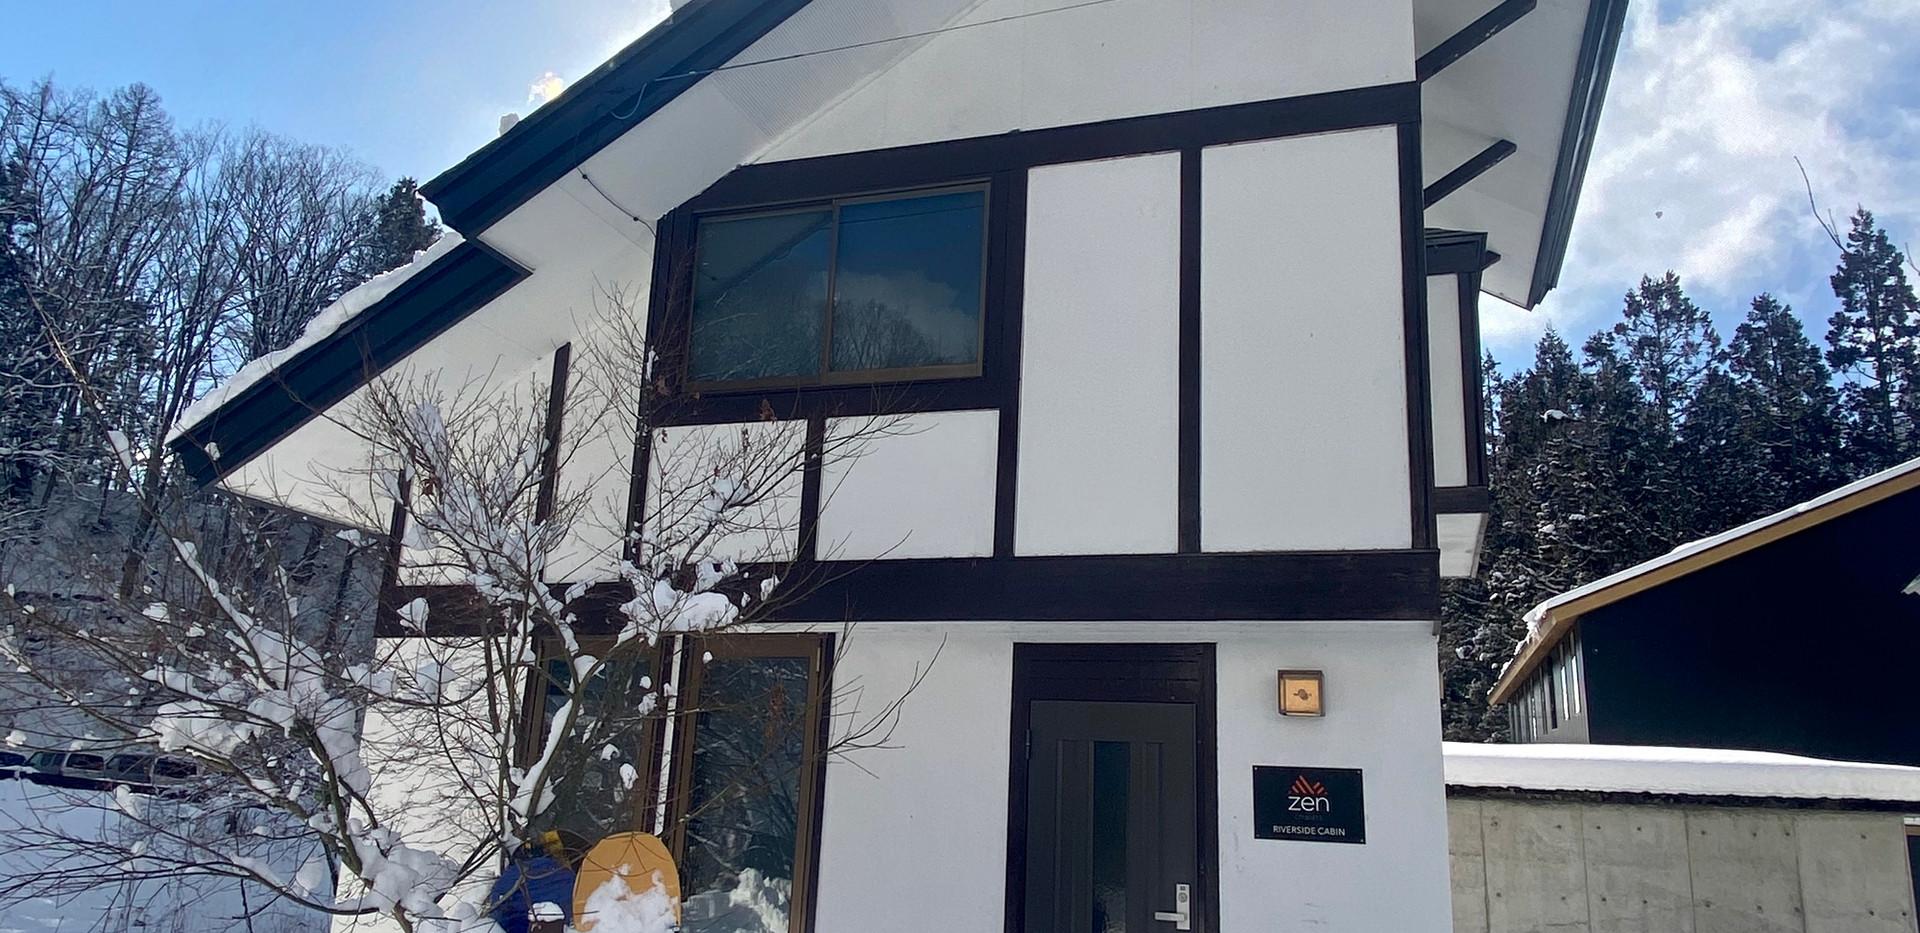 Cabins Riverside External 1.1.jpg